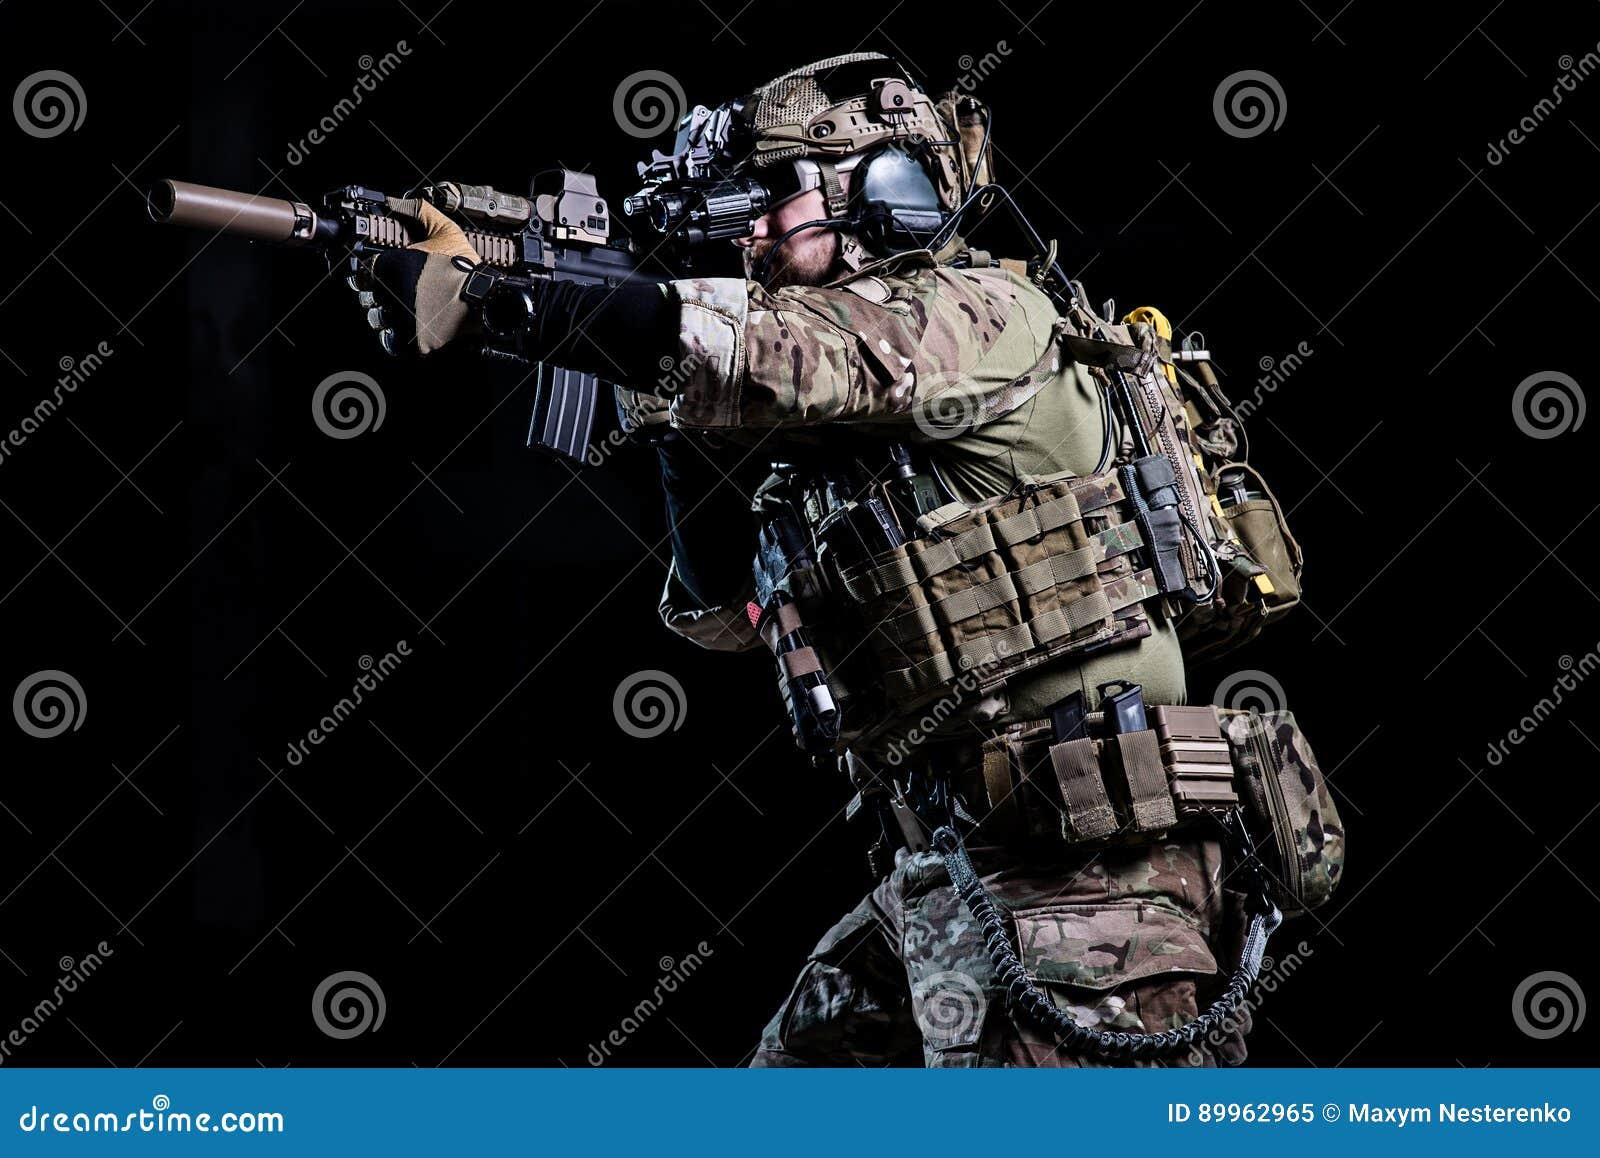 Spec ops soldier